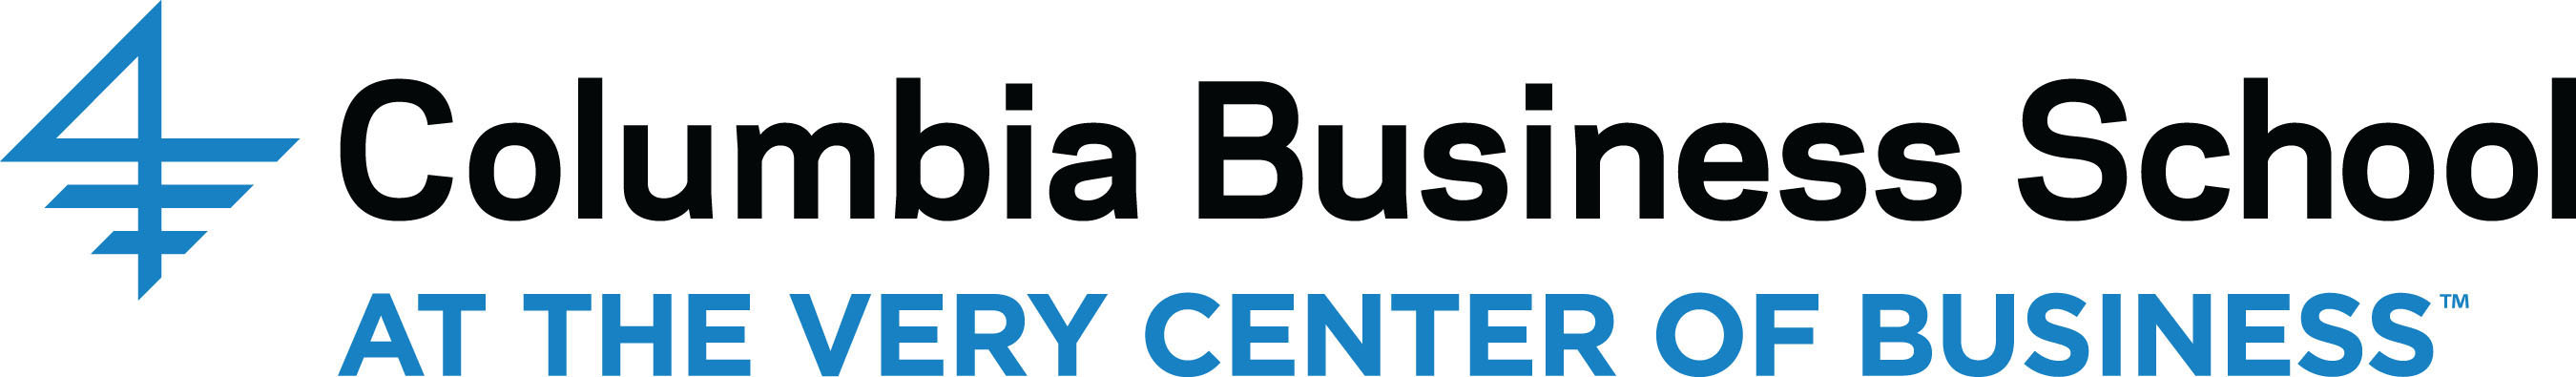 Columbia Business School Logo.